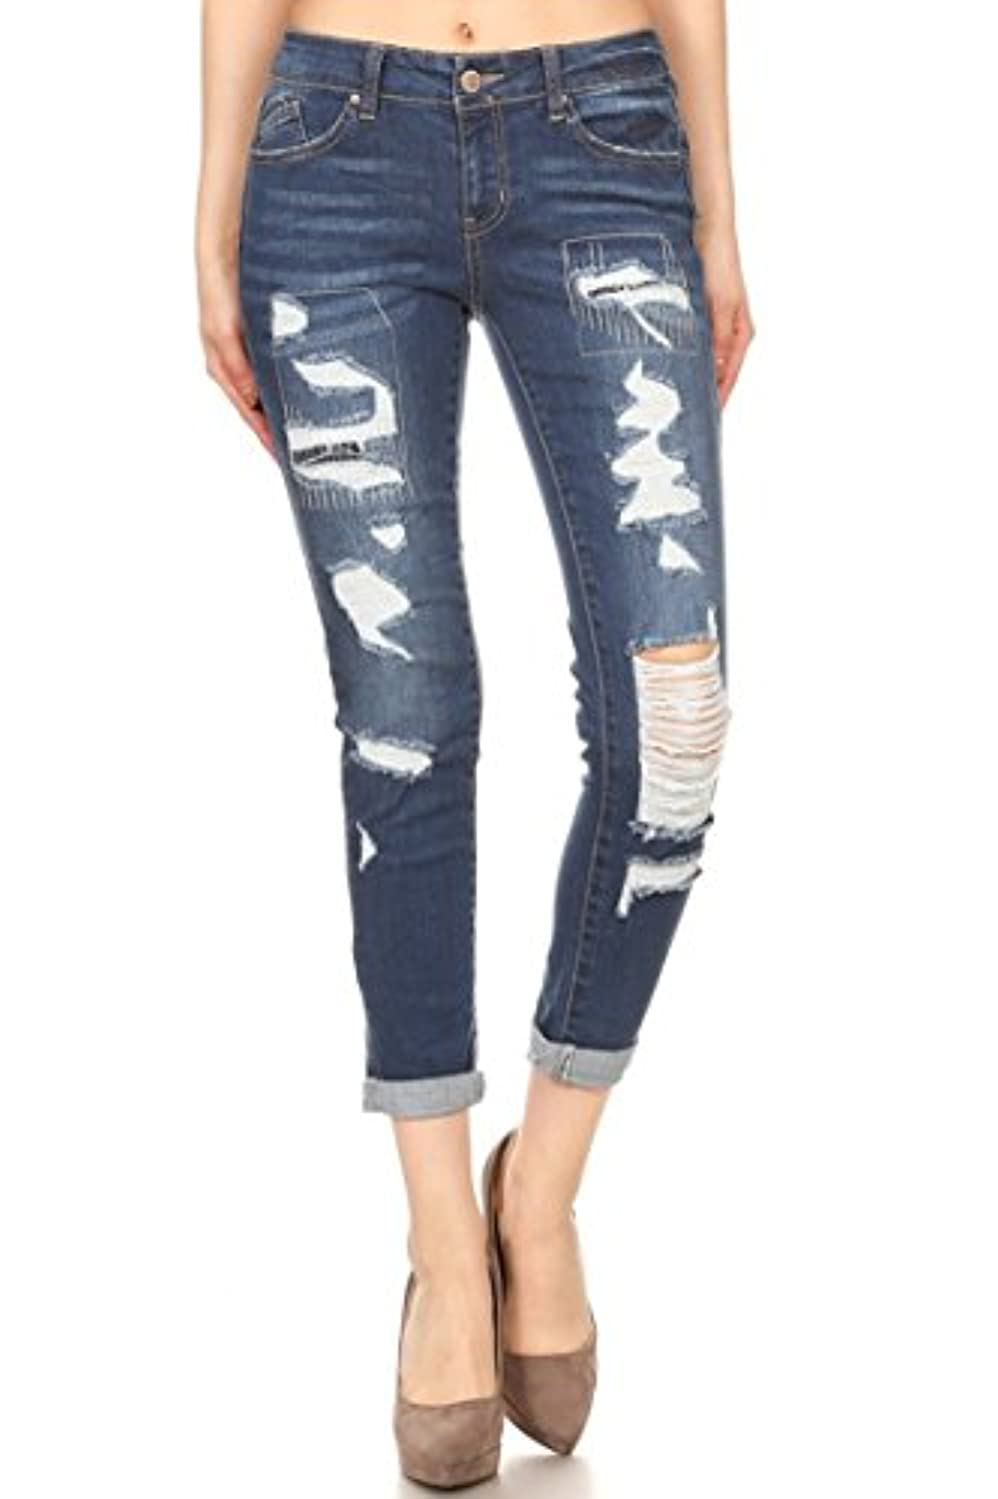 wax jean Women's Distressed Slim Fit Skinny Jeans Size 0 to 13